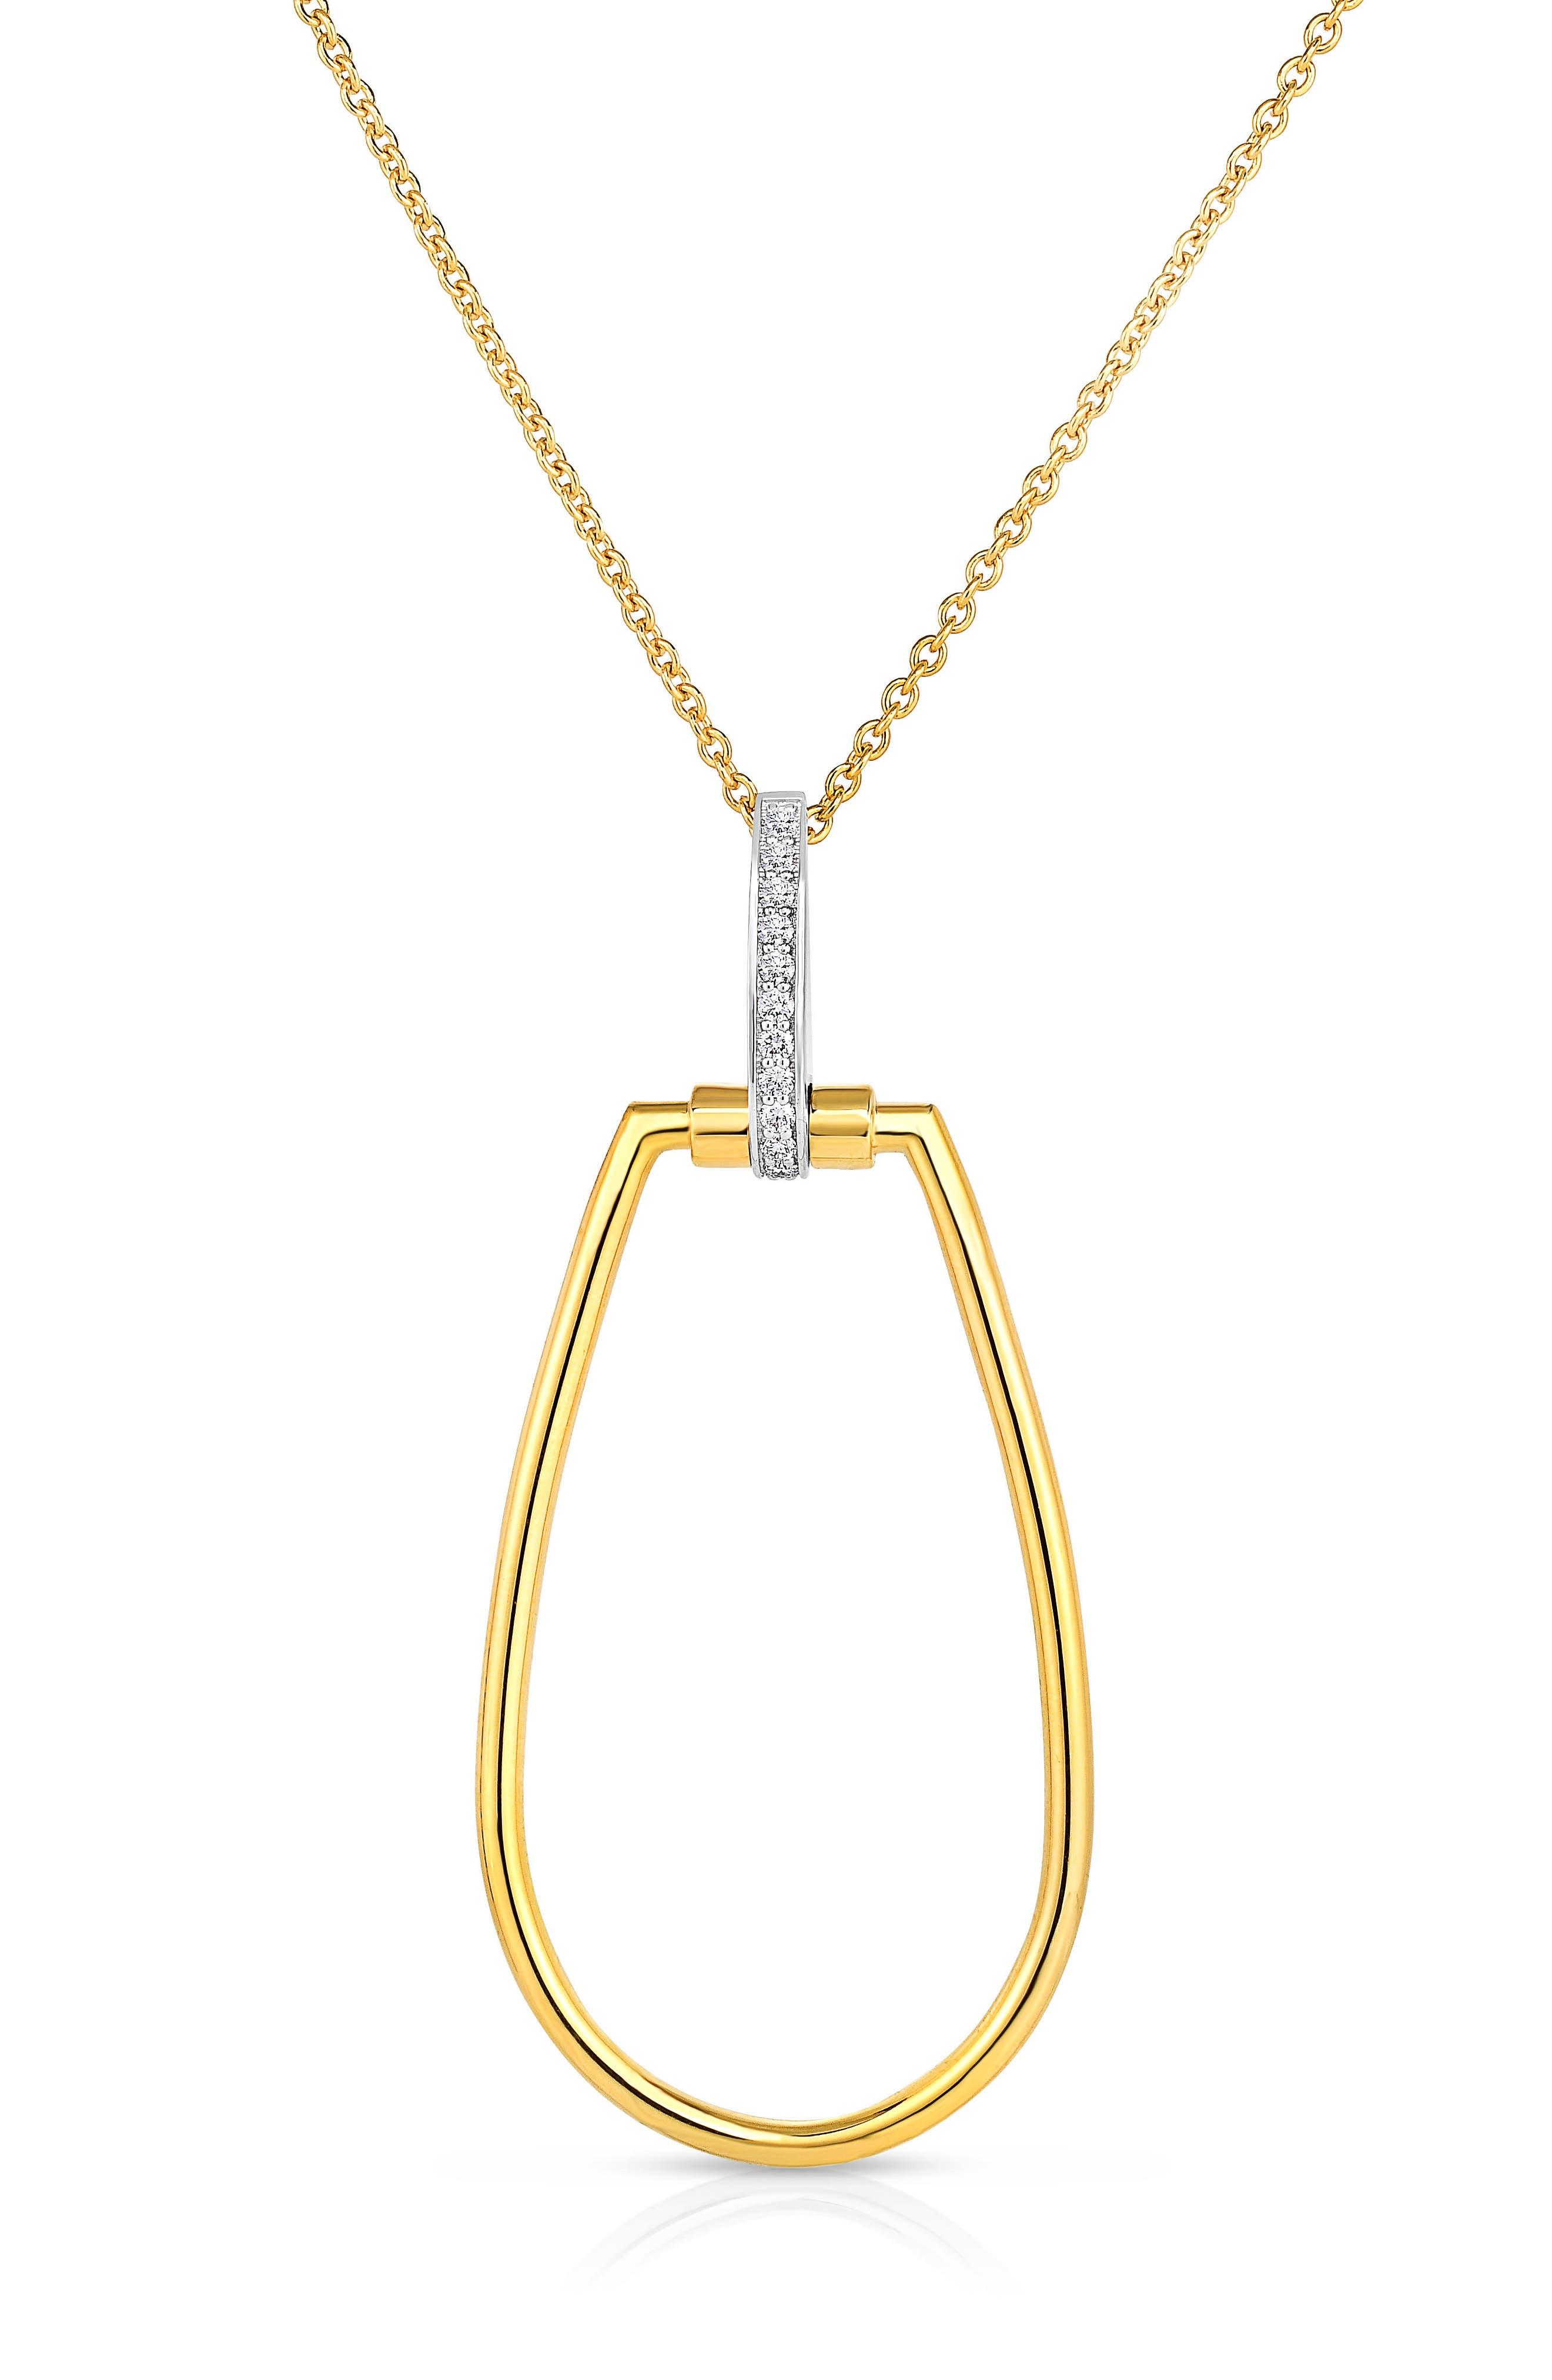 Roberto Coin Classica Parisienne Diamond Oval Necklace